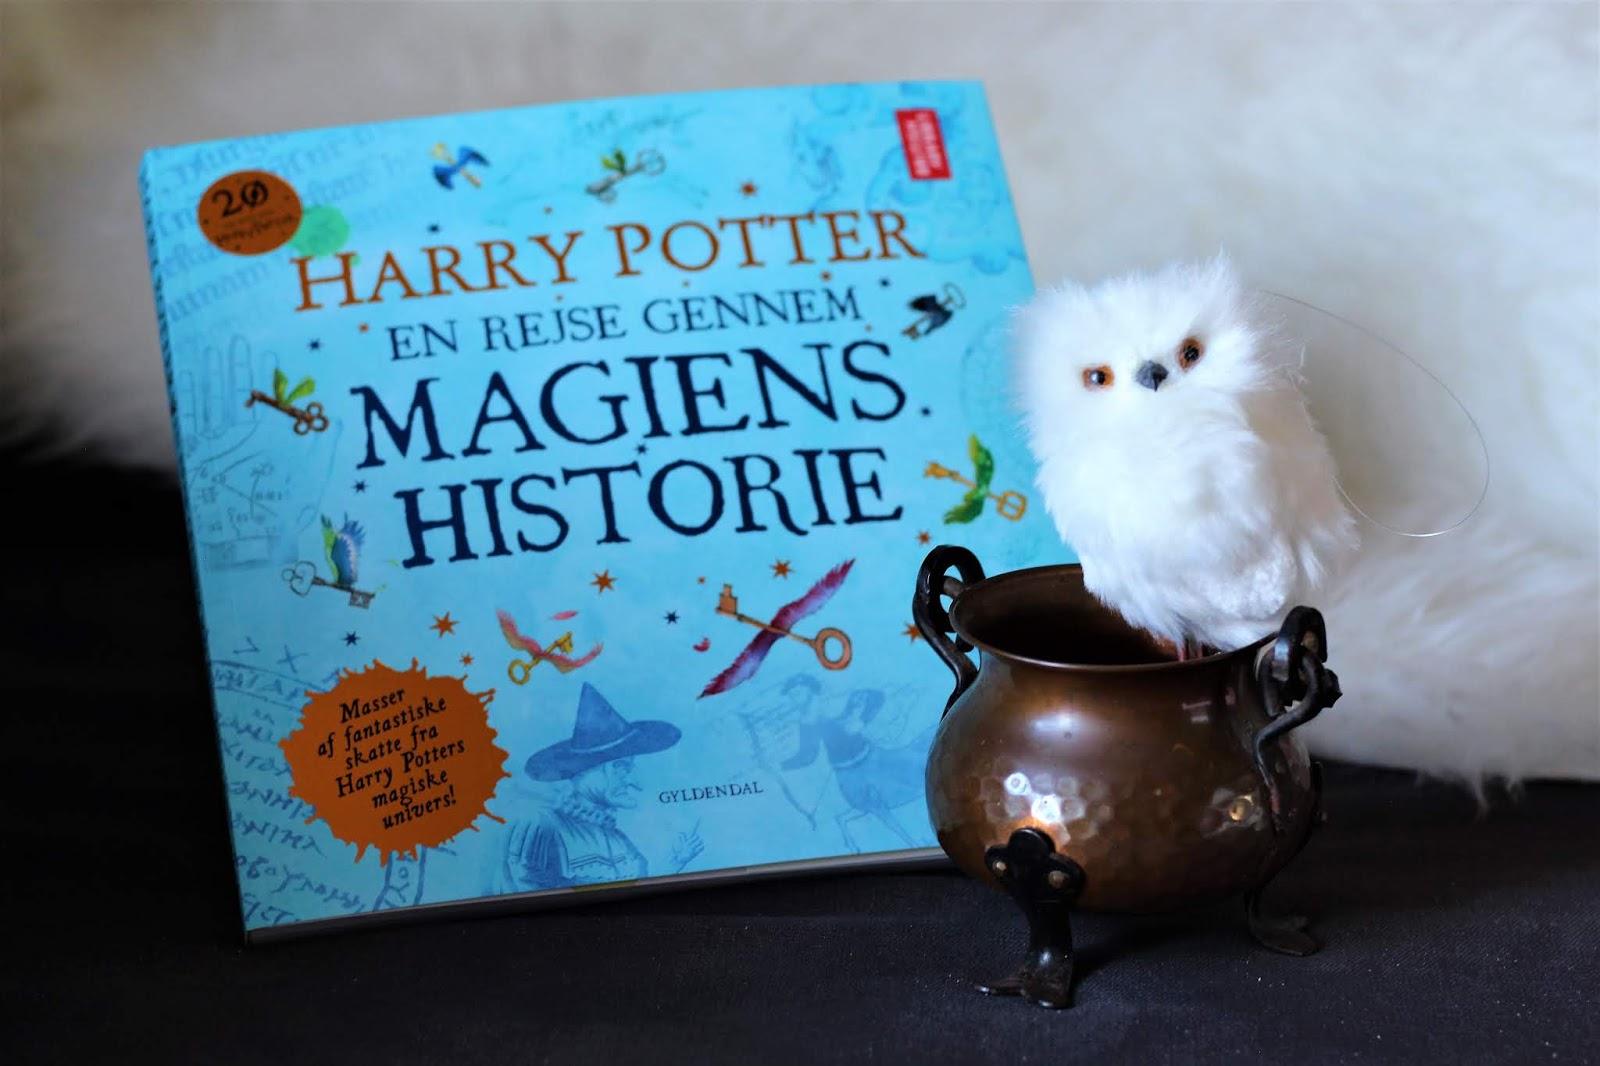 harry potter historie